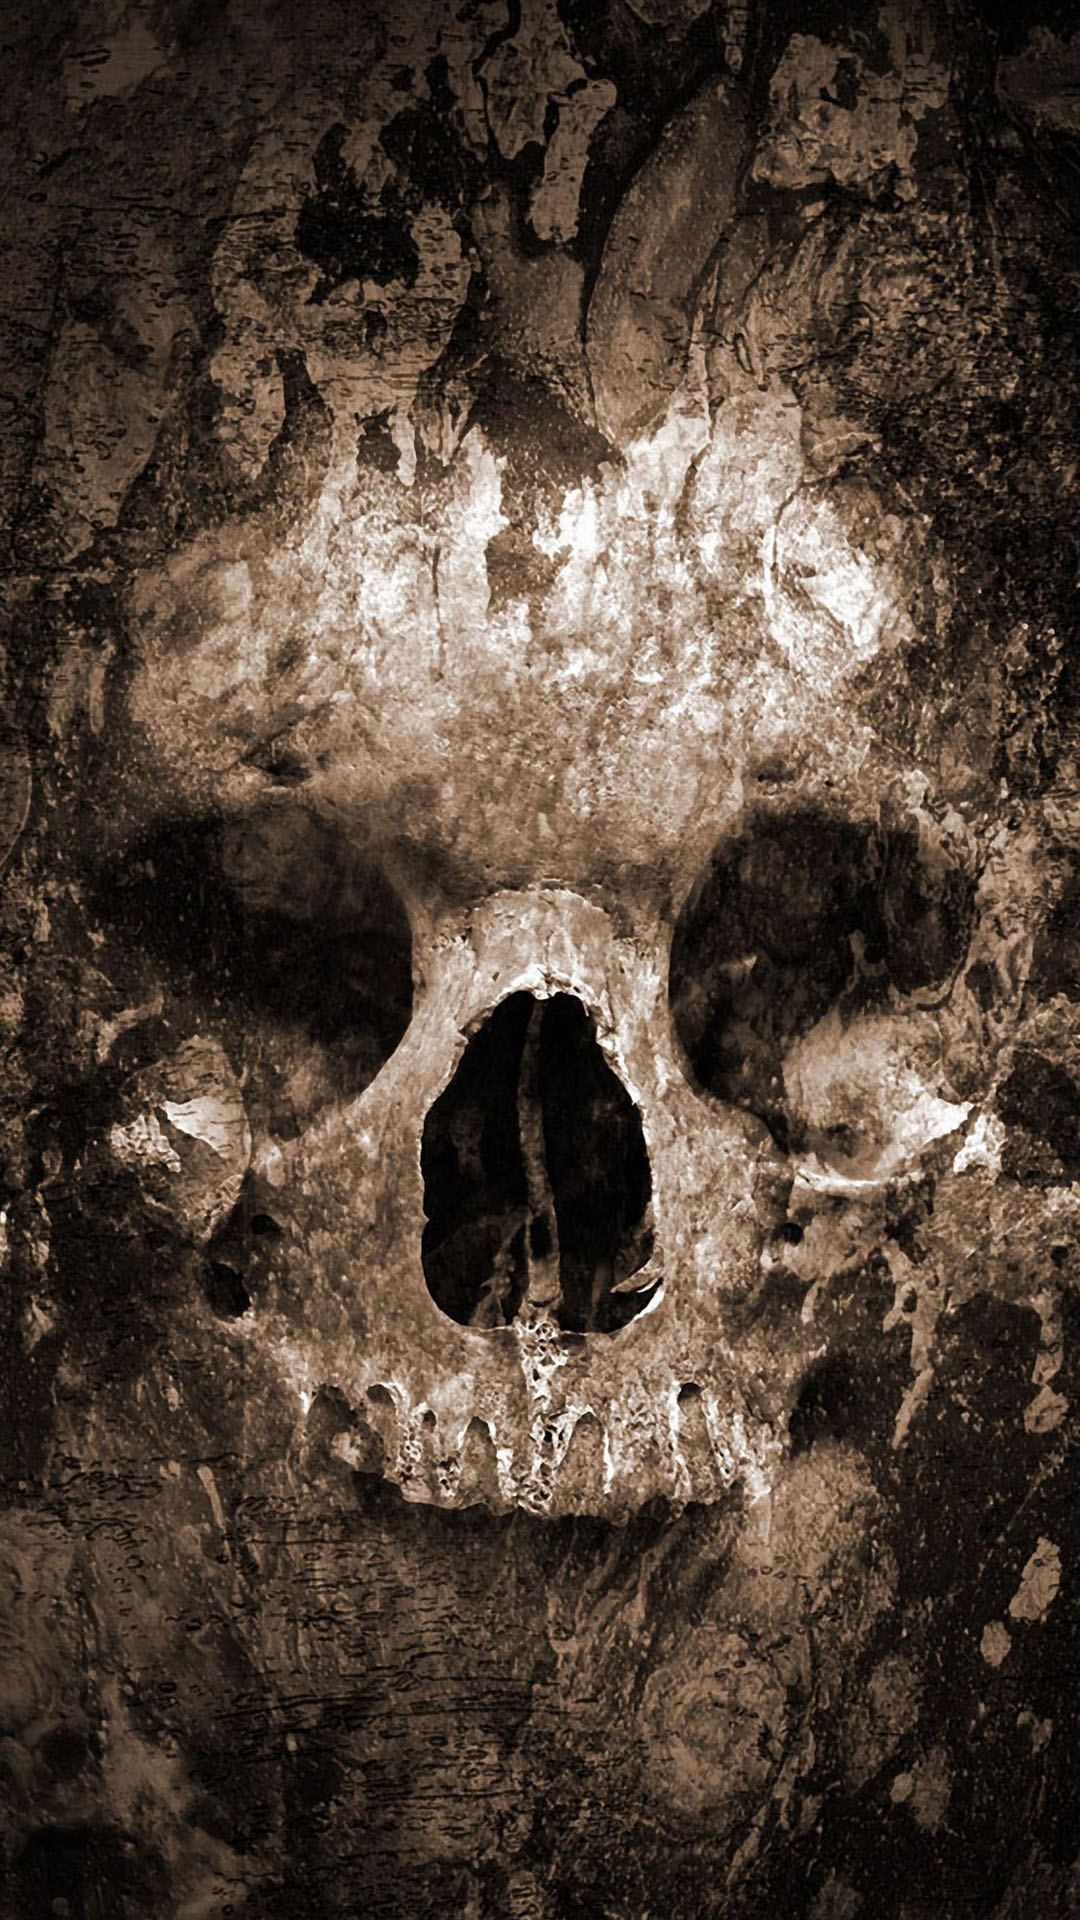 Fantastic   Wallpaper Home Screen Skull - quake-skull-lockscreen-android-wallpaper  You Should Have_742989.jpg